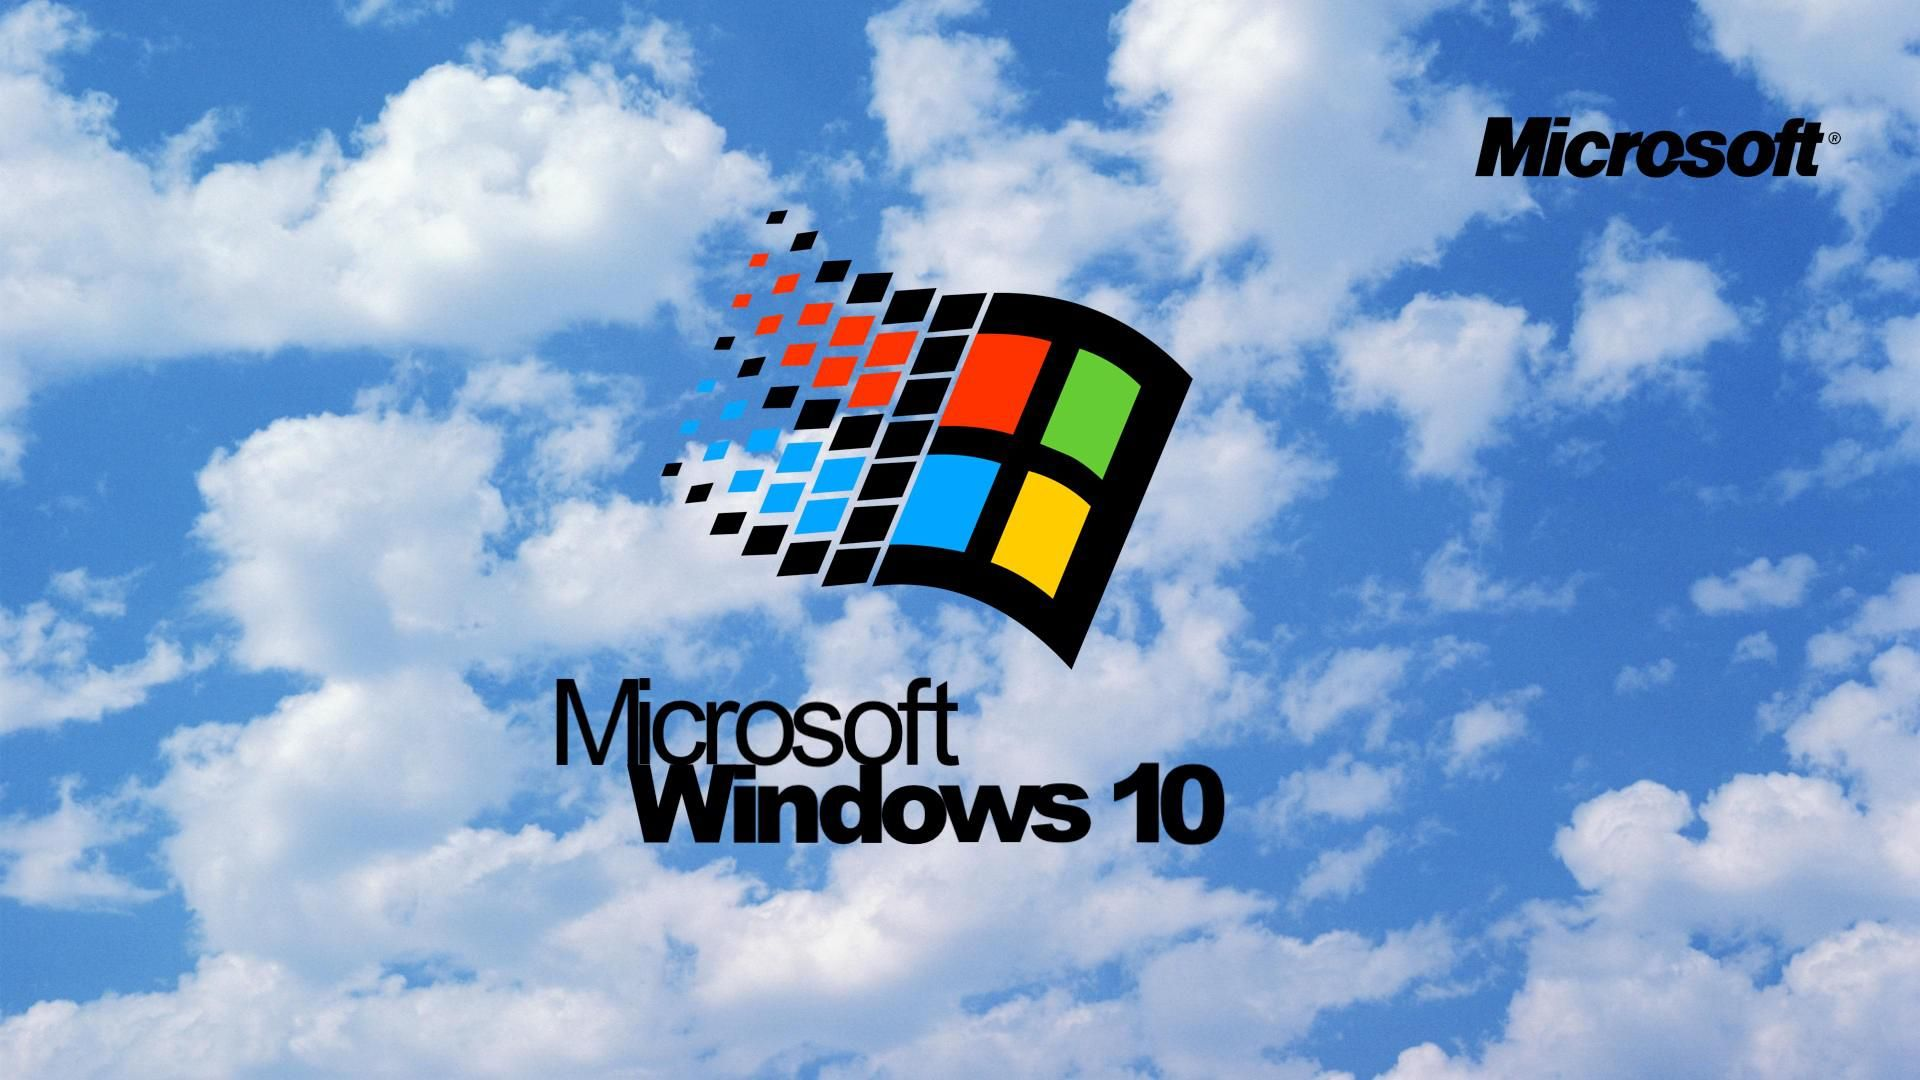 I Remade The Windows 98 Wallpaper For Windows 10 1920x1080 Aesthetic Desktop Wallpaper Desktop Wallpaper 1920x1080 Windows 10 Desktop Backgrounds